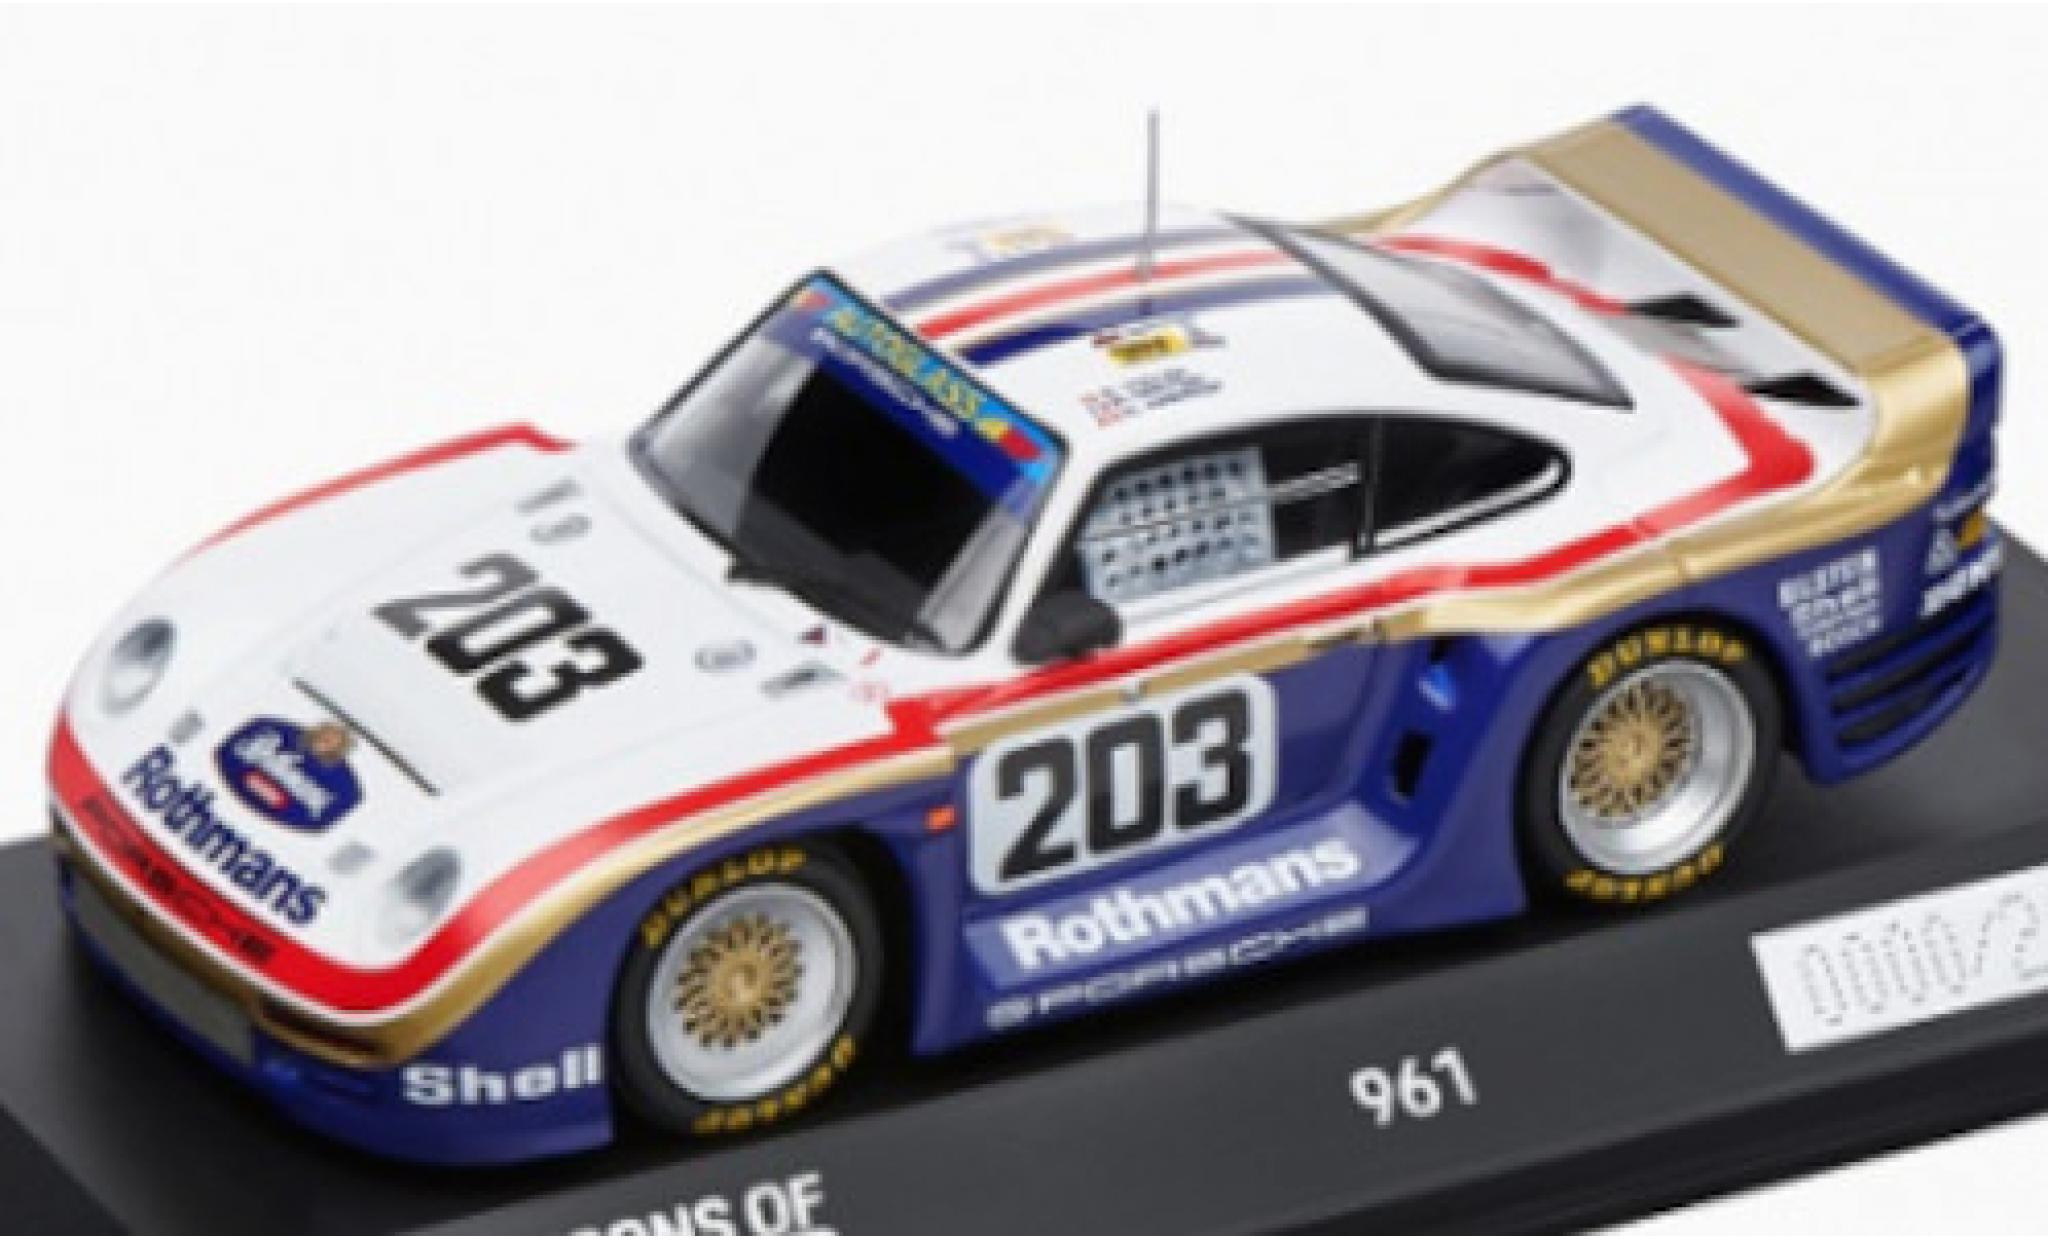 Porsche 961 1/43 I Spark No.203 Rothmans AG Rothmans 24h Le Mans 1987 R.Metge/C.Haldi/K.Nierop